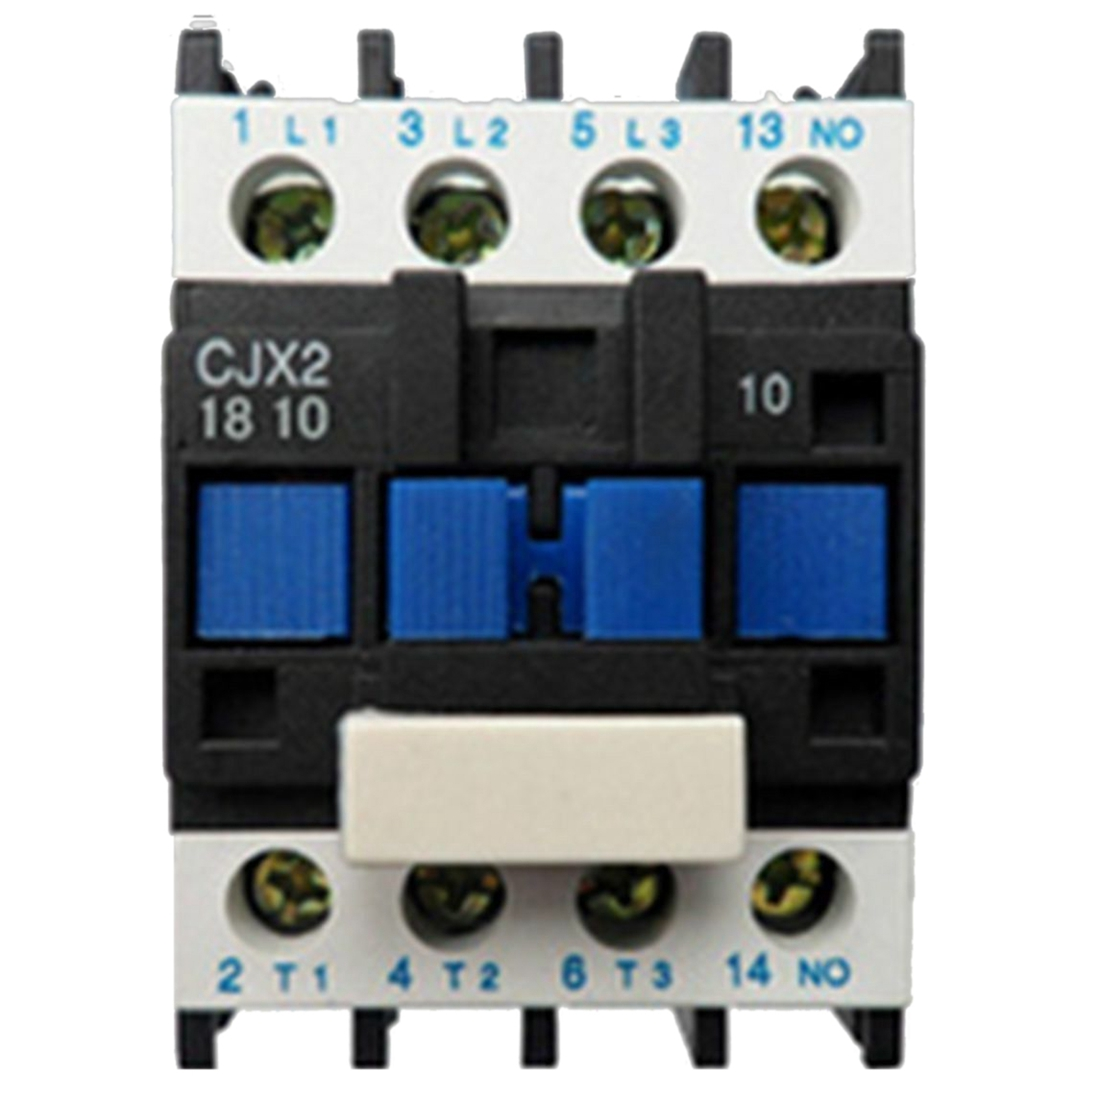 цена на AC Contactor Motor Starter Relay (LC1) CJX2-1810 3P+NO 220V Coil 18A 4KW Blue&black